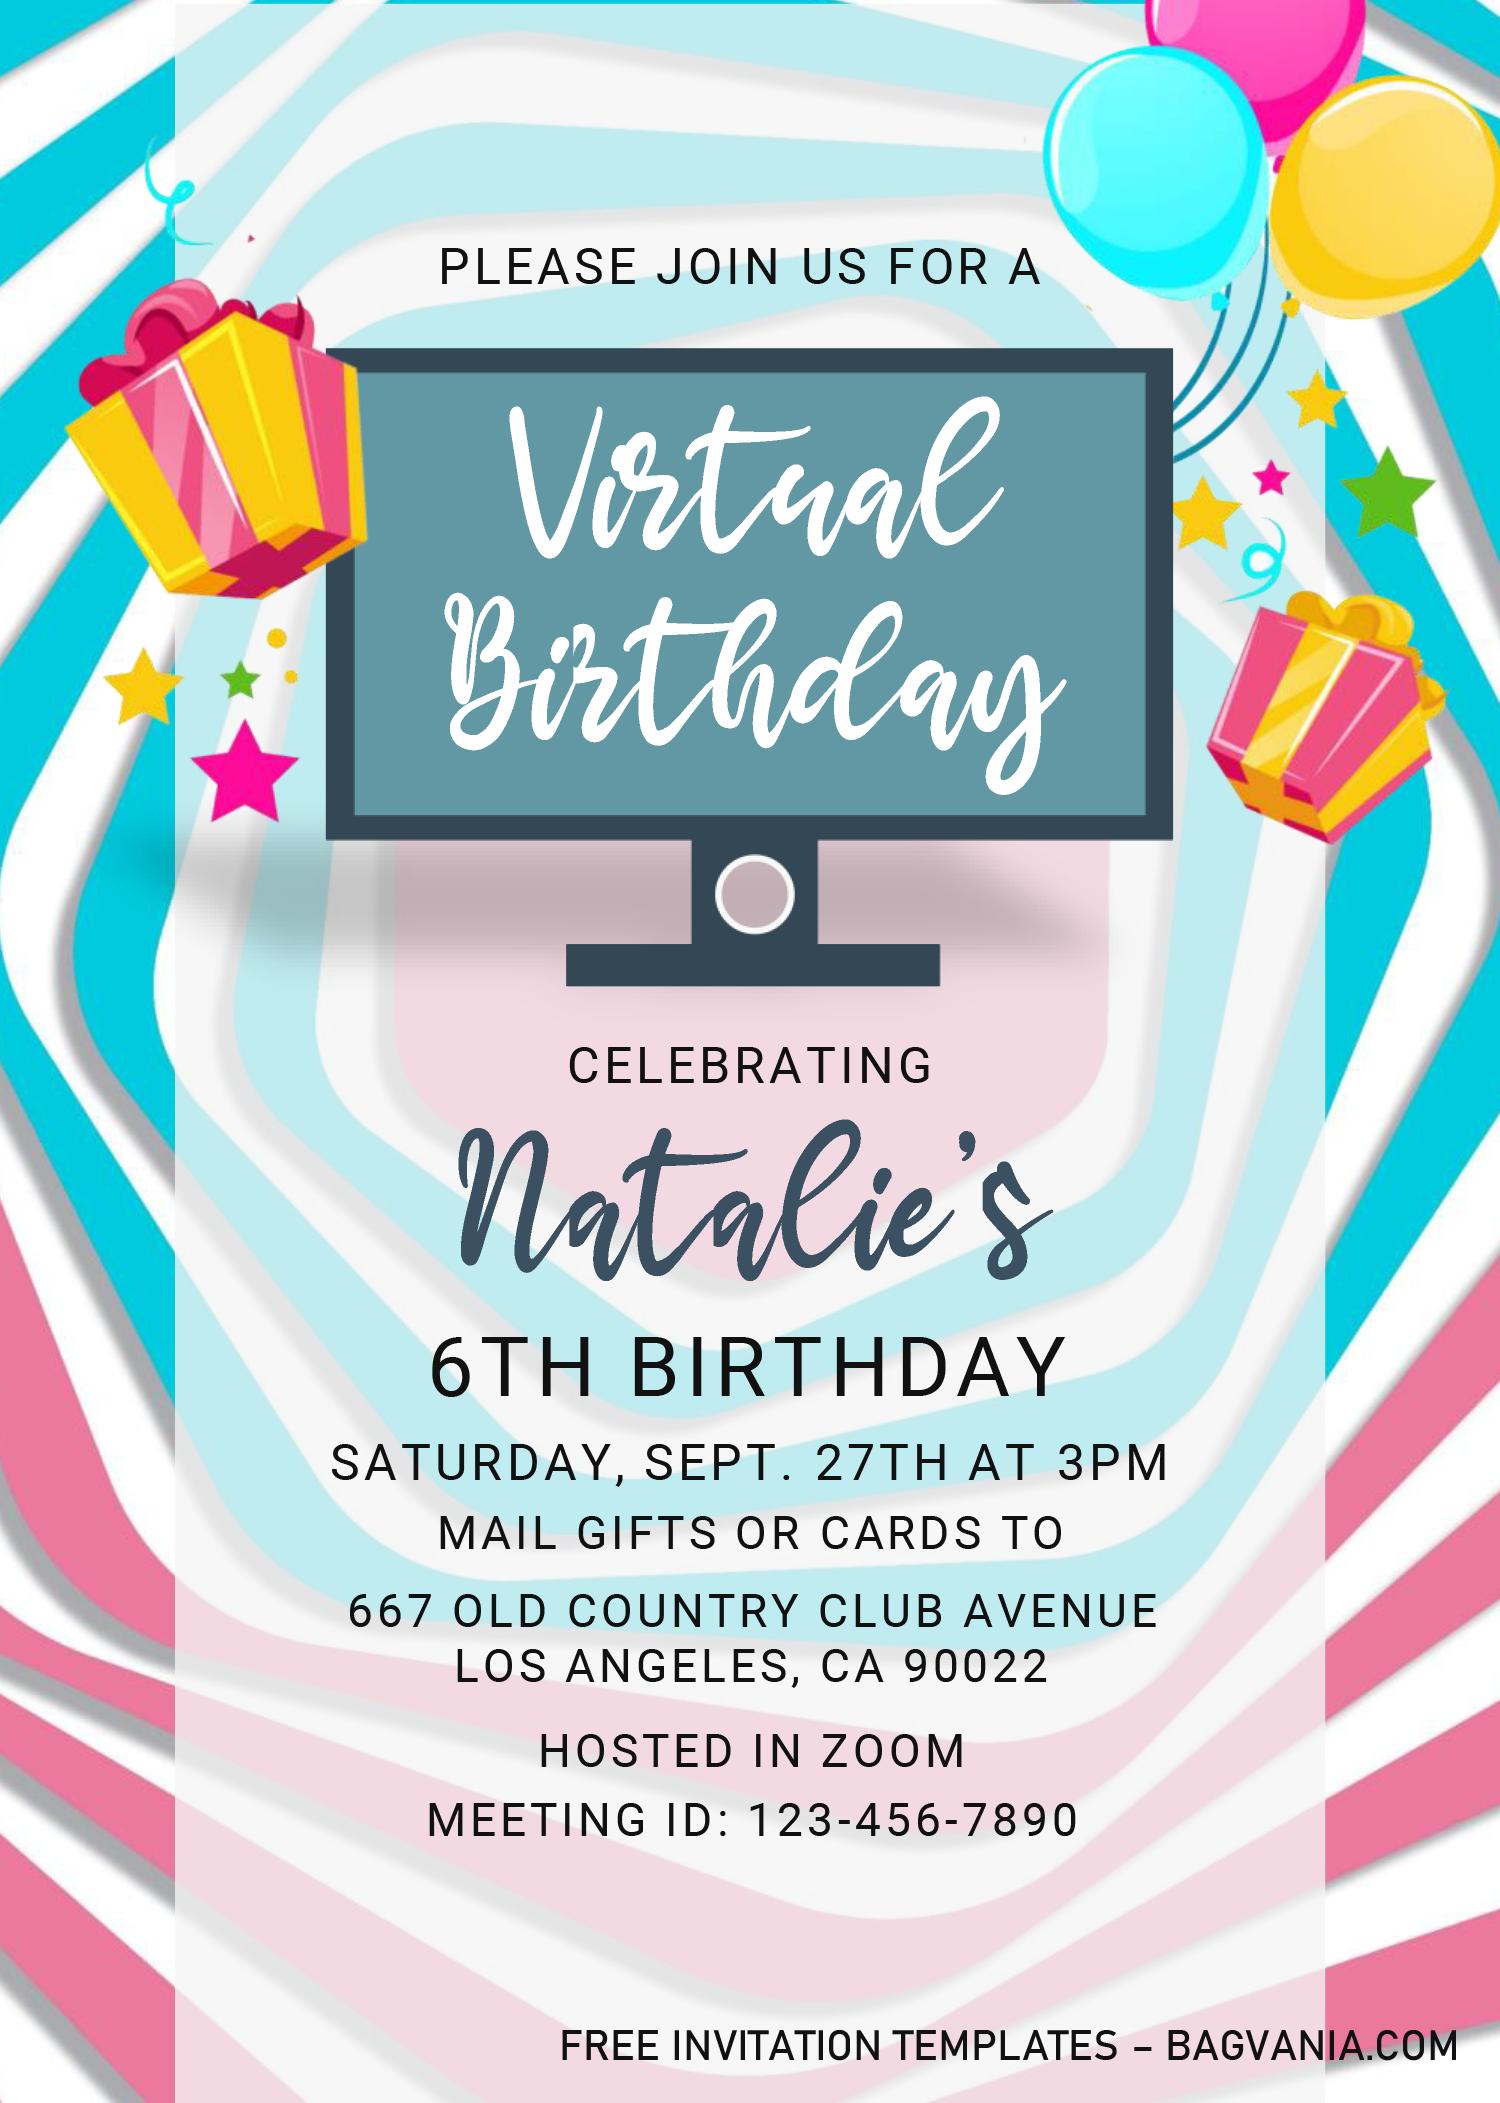 Virtual Party Invitation Templates Editable With Microsoft Word Party Invite Template Invitation Template Virtual Party